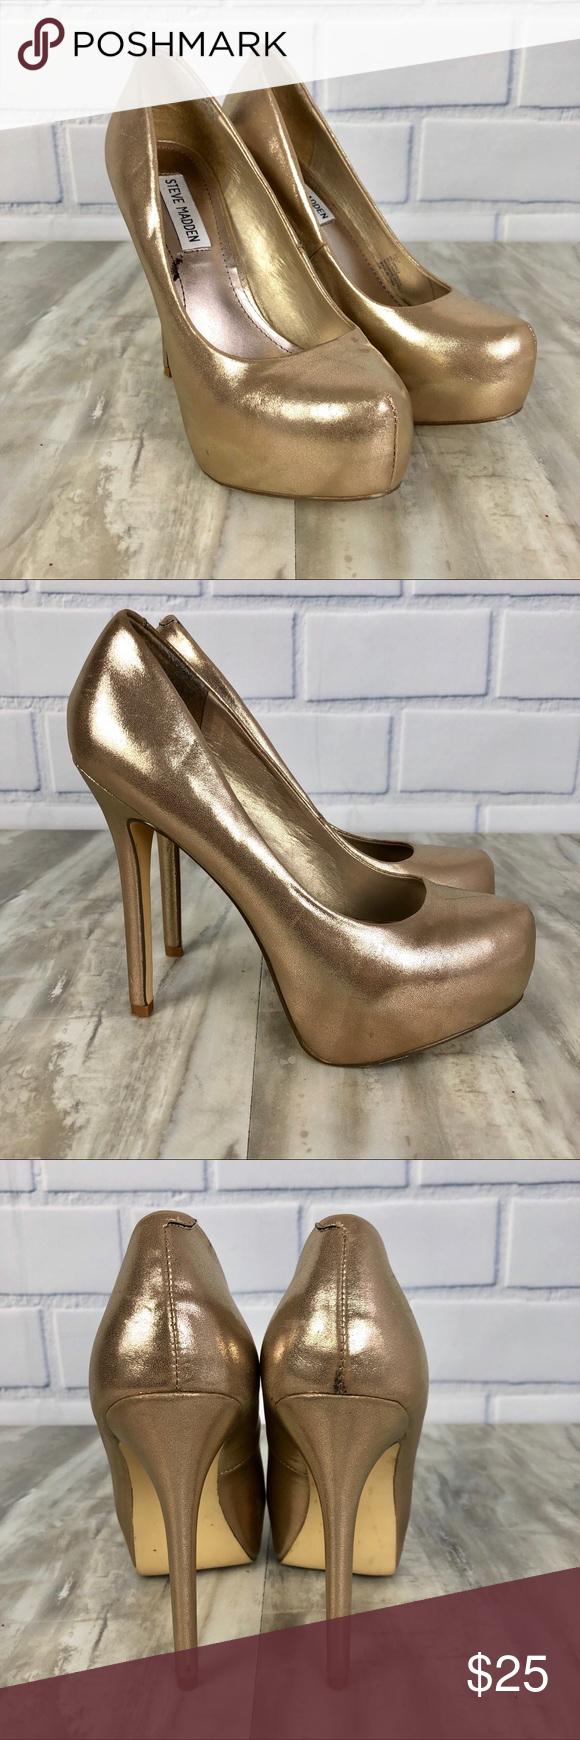 32cede22541 Steve Madden NALA Gold Metallic Heels Preowned Women s Steve Madden NALA  Shimmer Platform Heels Size 7.5